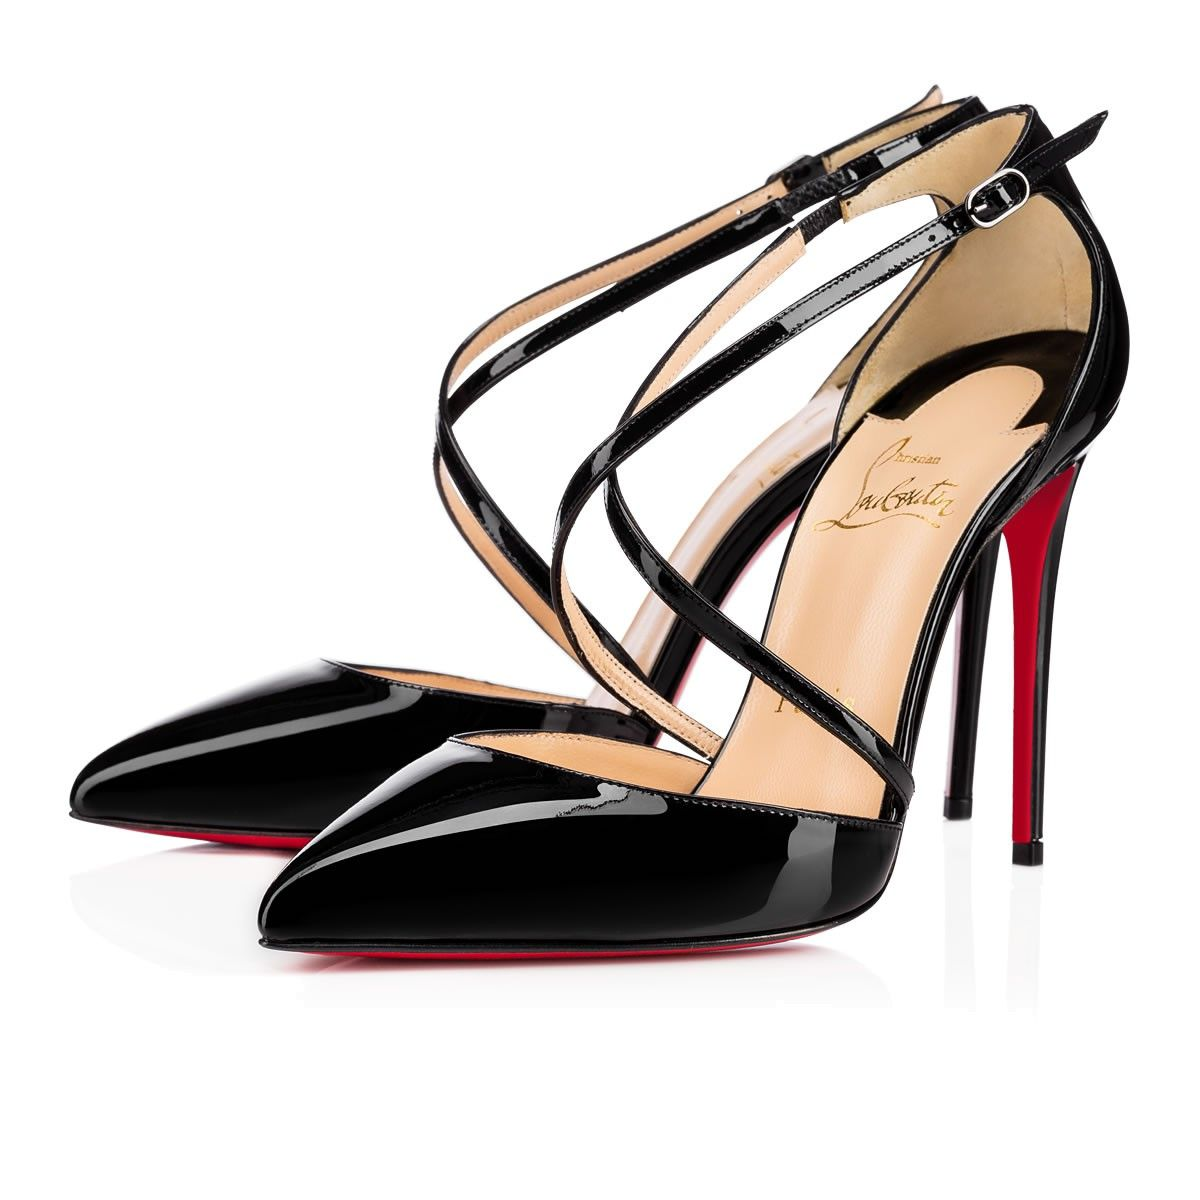 comment chausse les chaussures louboutin